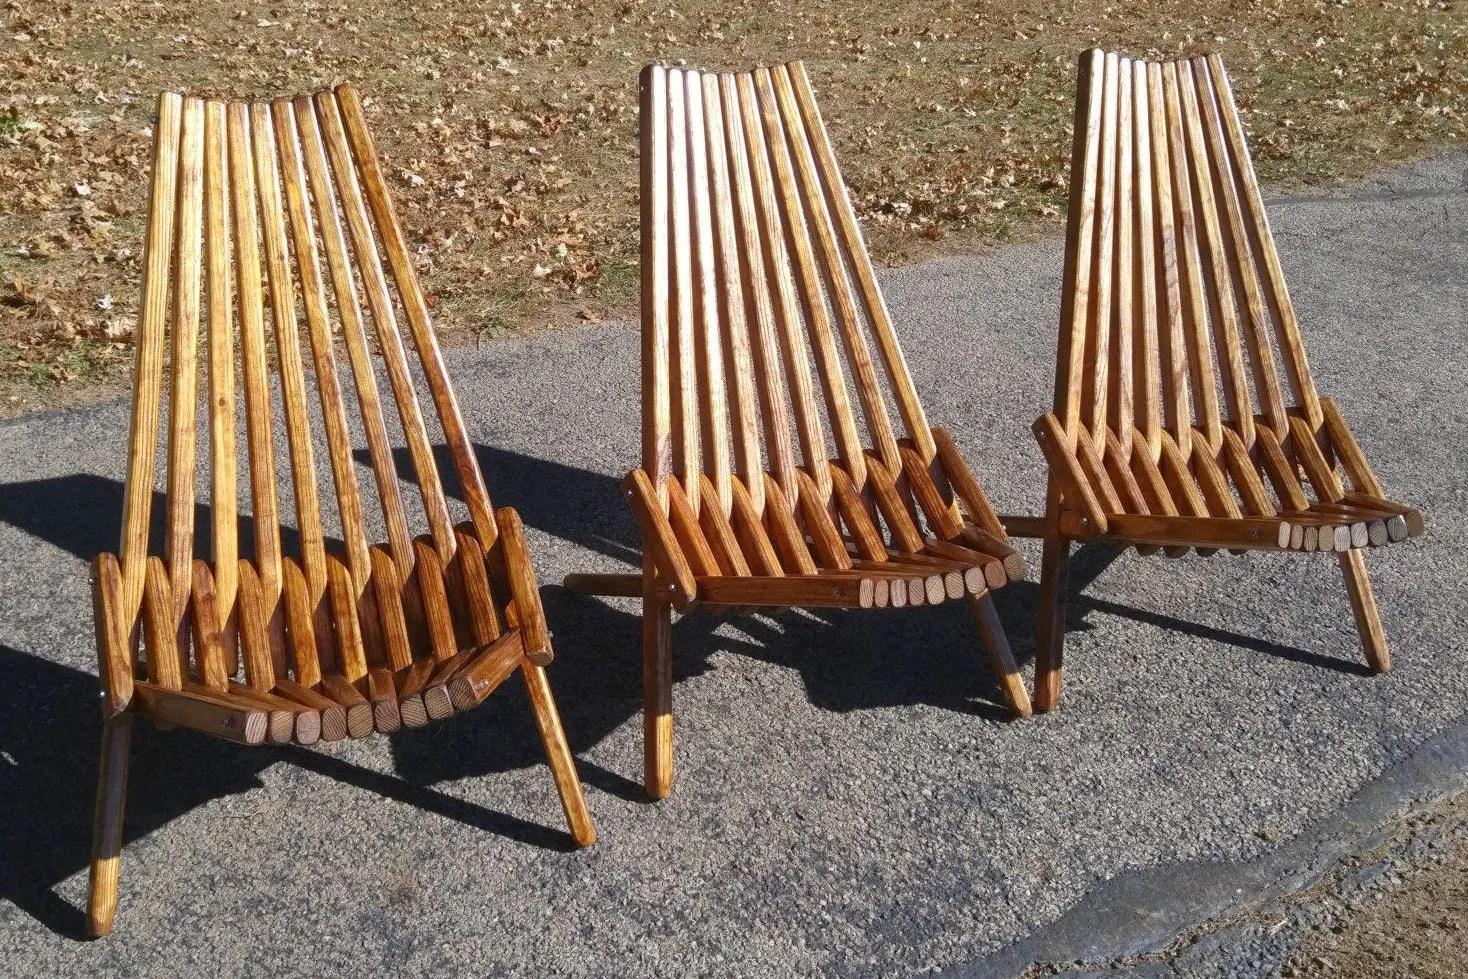 patio chair outdoor furniture adirondack accent kentucky stick camping beach folding belize source napa bar side s